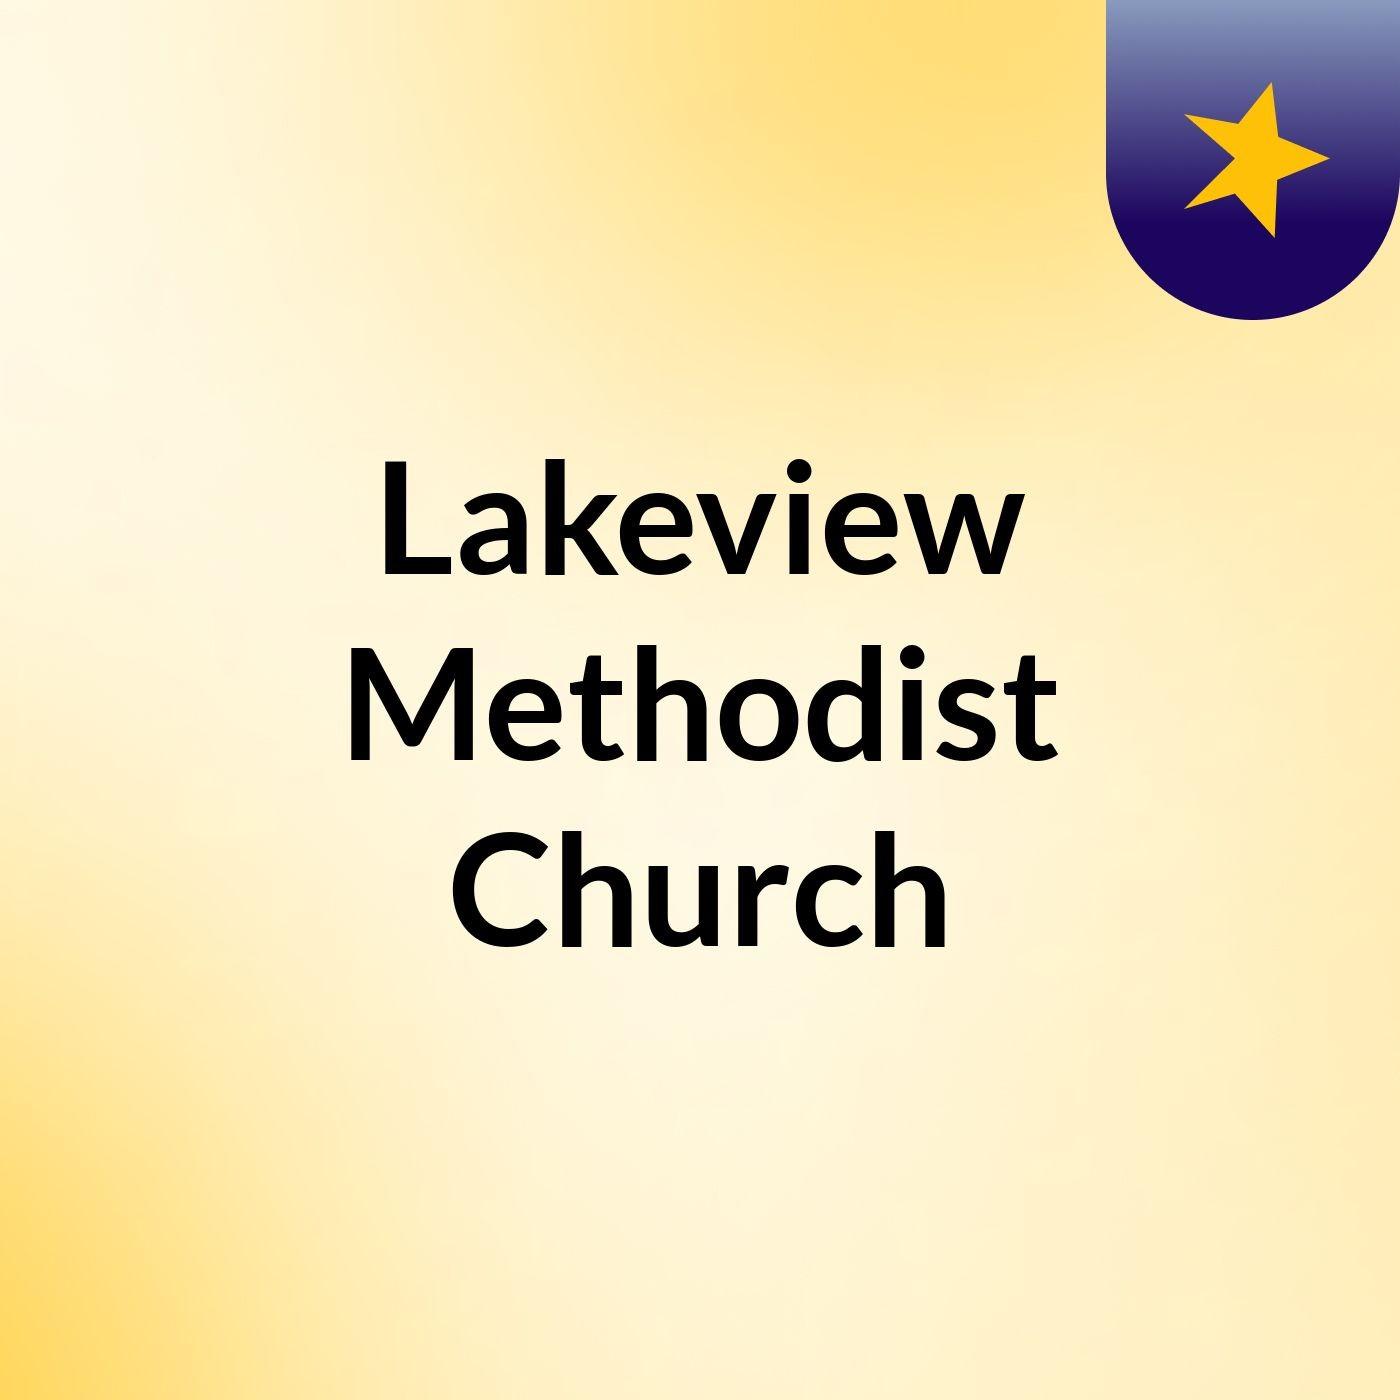 Lakeview Methodist Church